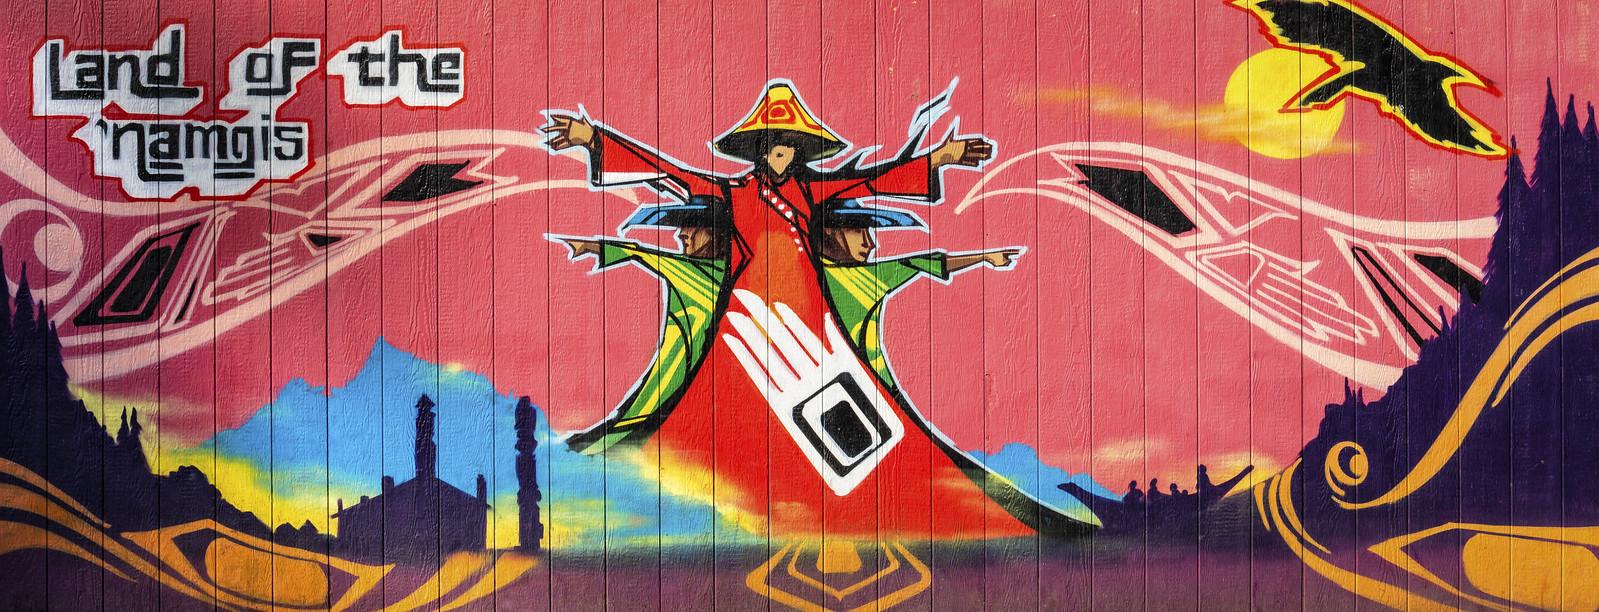 Namgis Nation - Alert Bay Kwakwaka'wakw First Nations